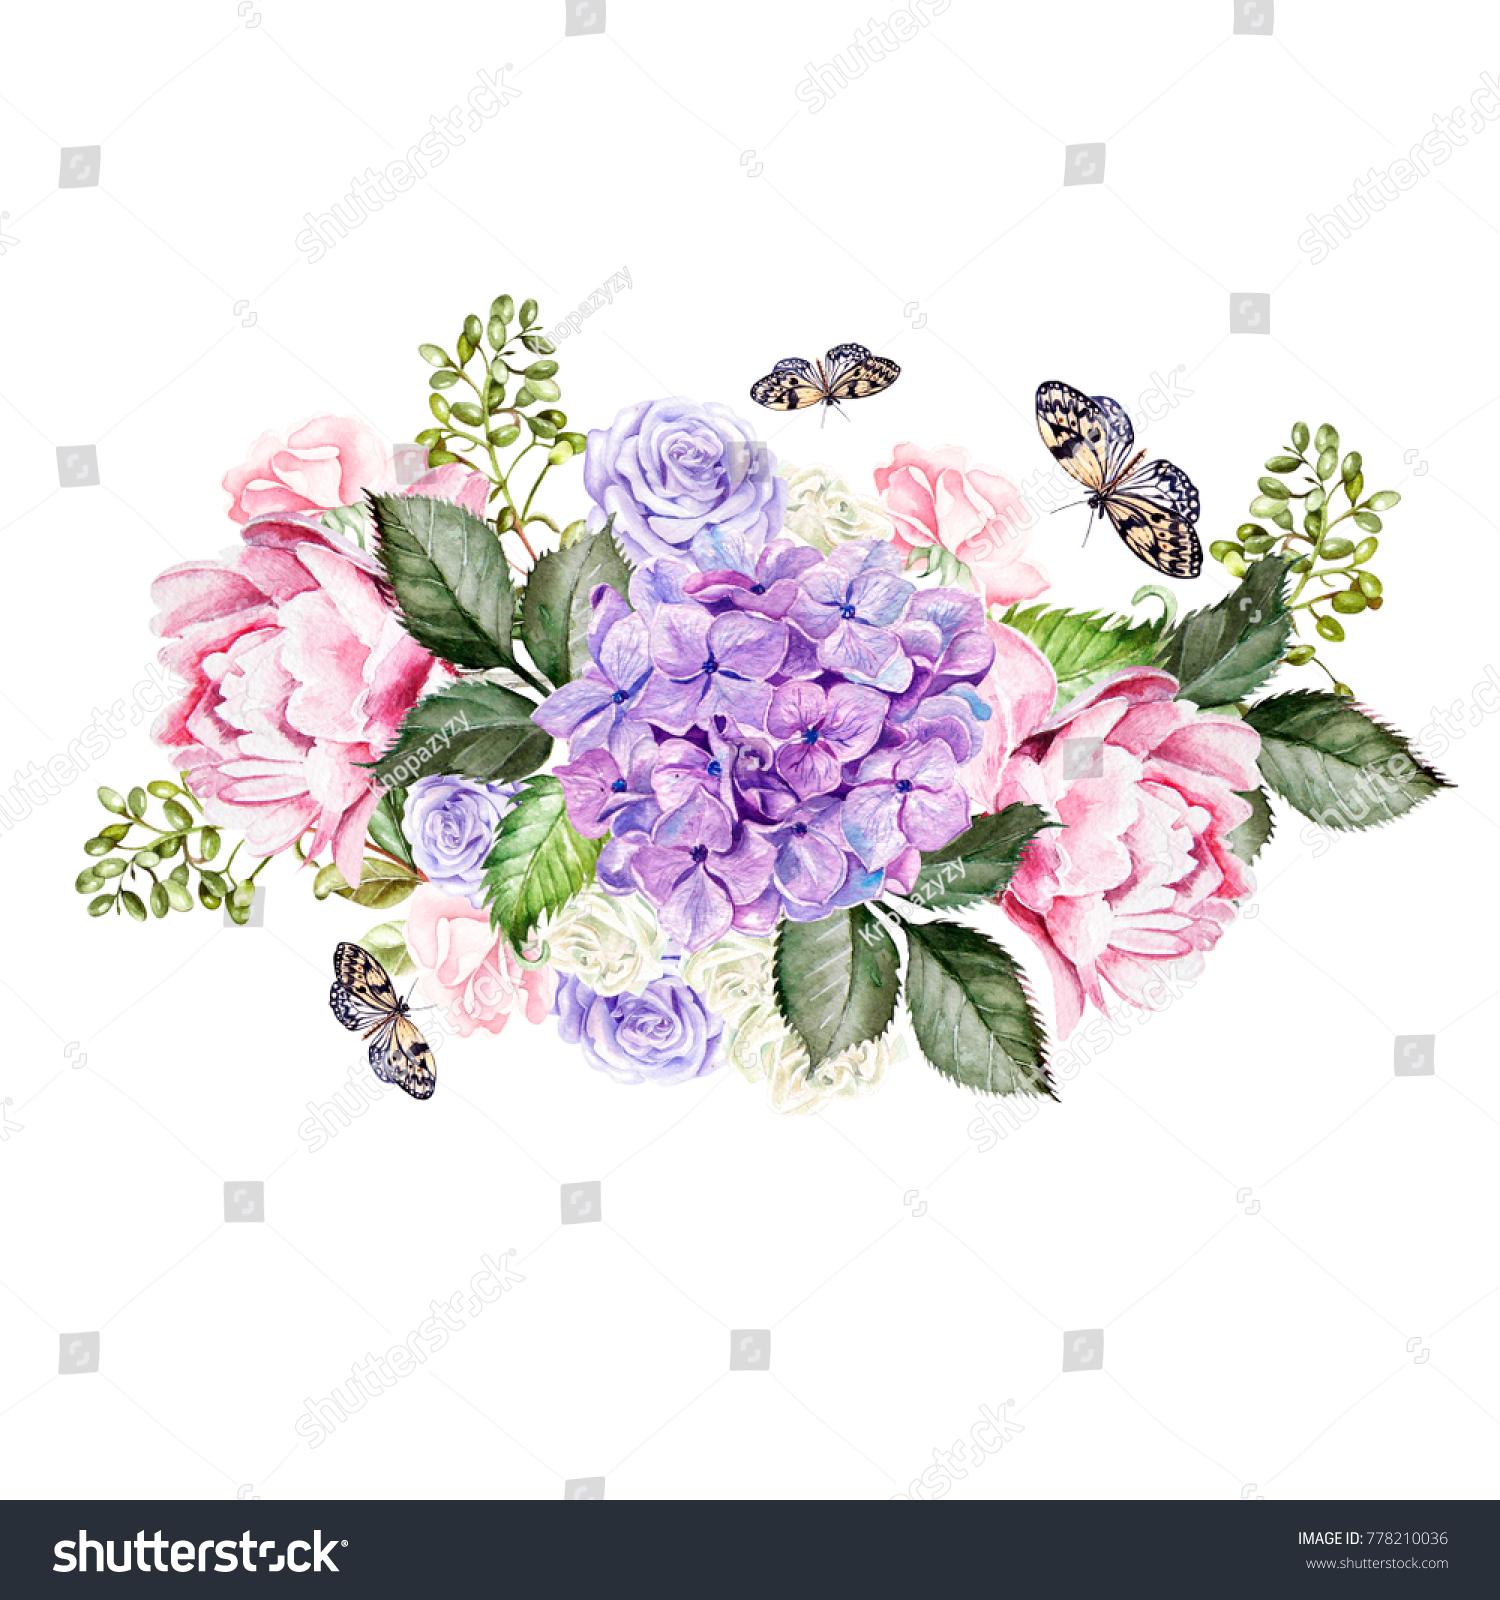 Watercolor Wedding Bouquet Rose Peony Hydrangea Stock Illustration ...